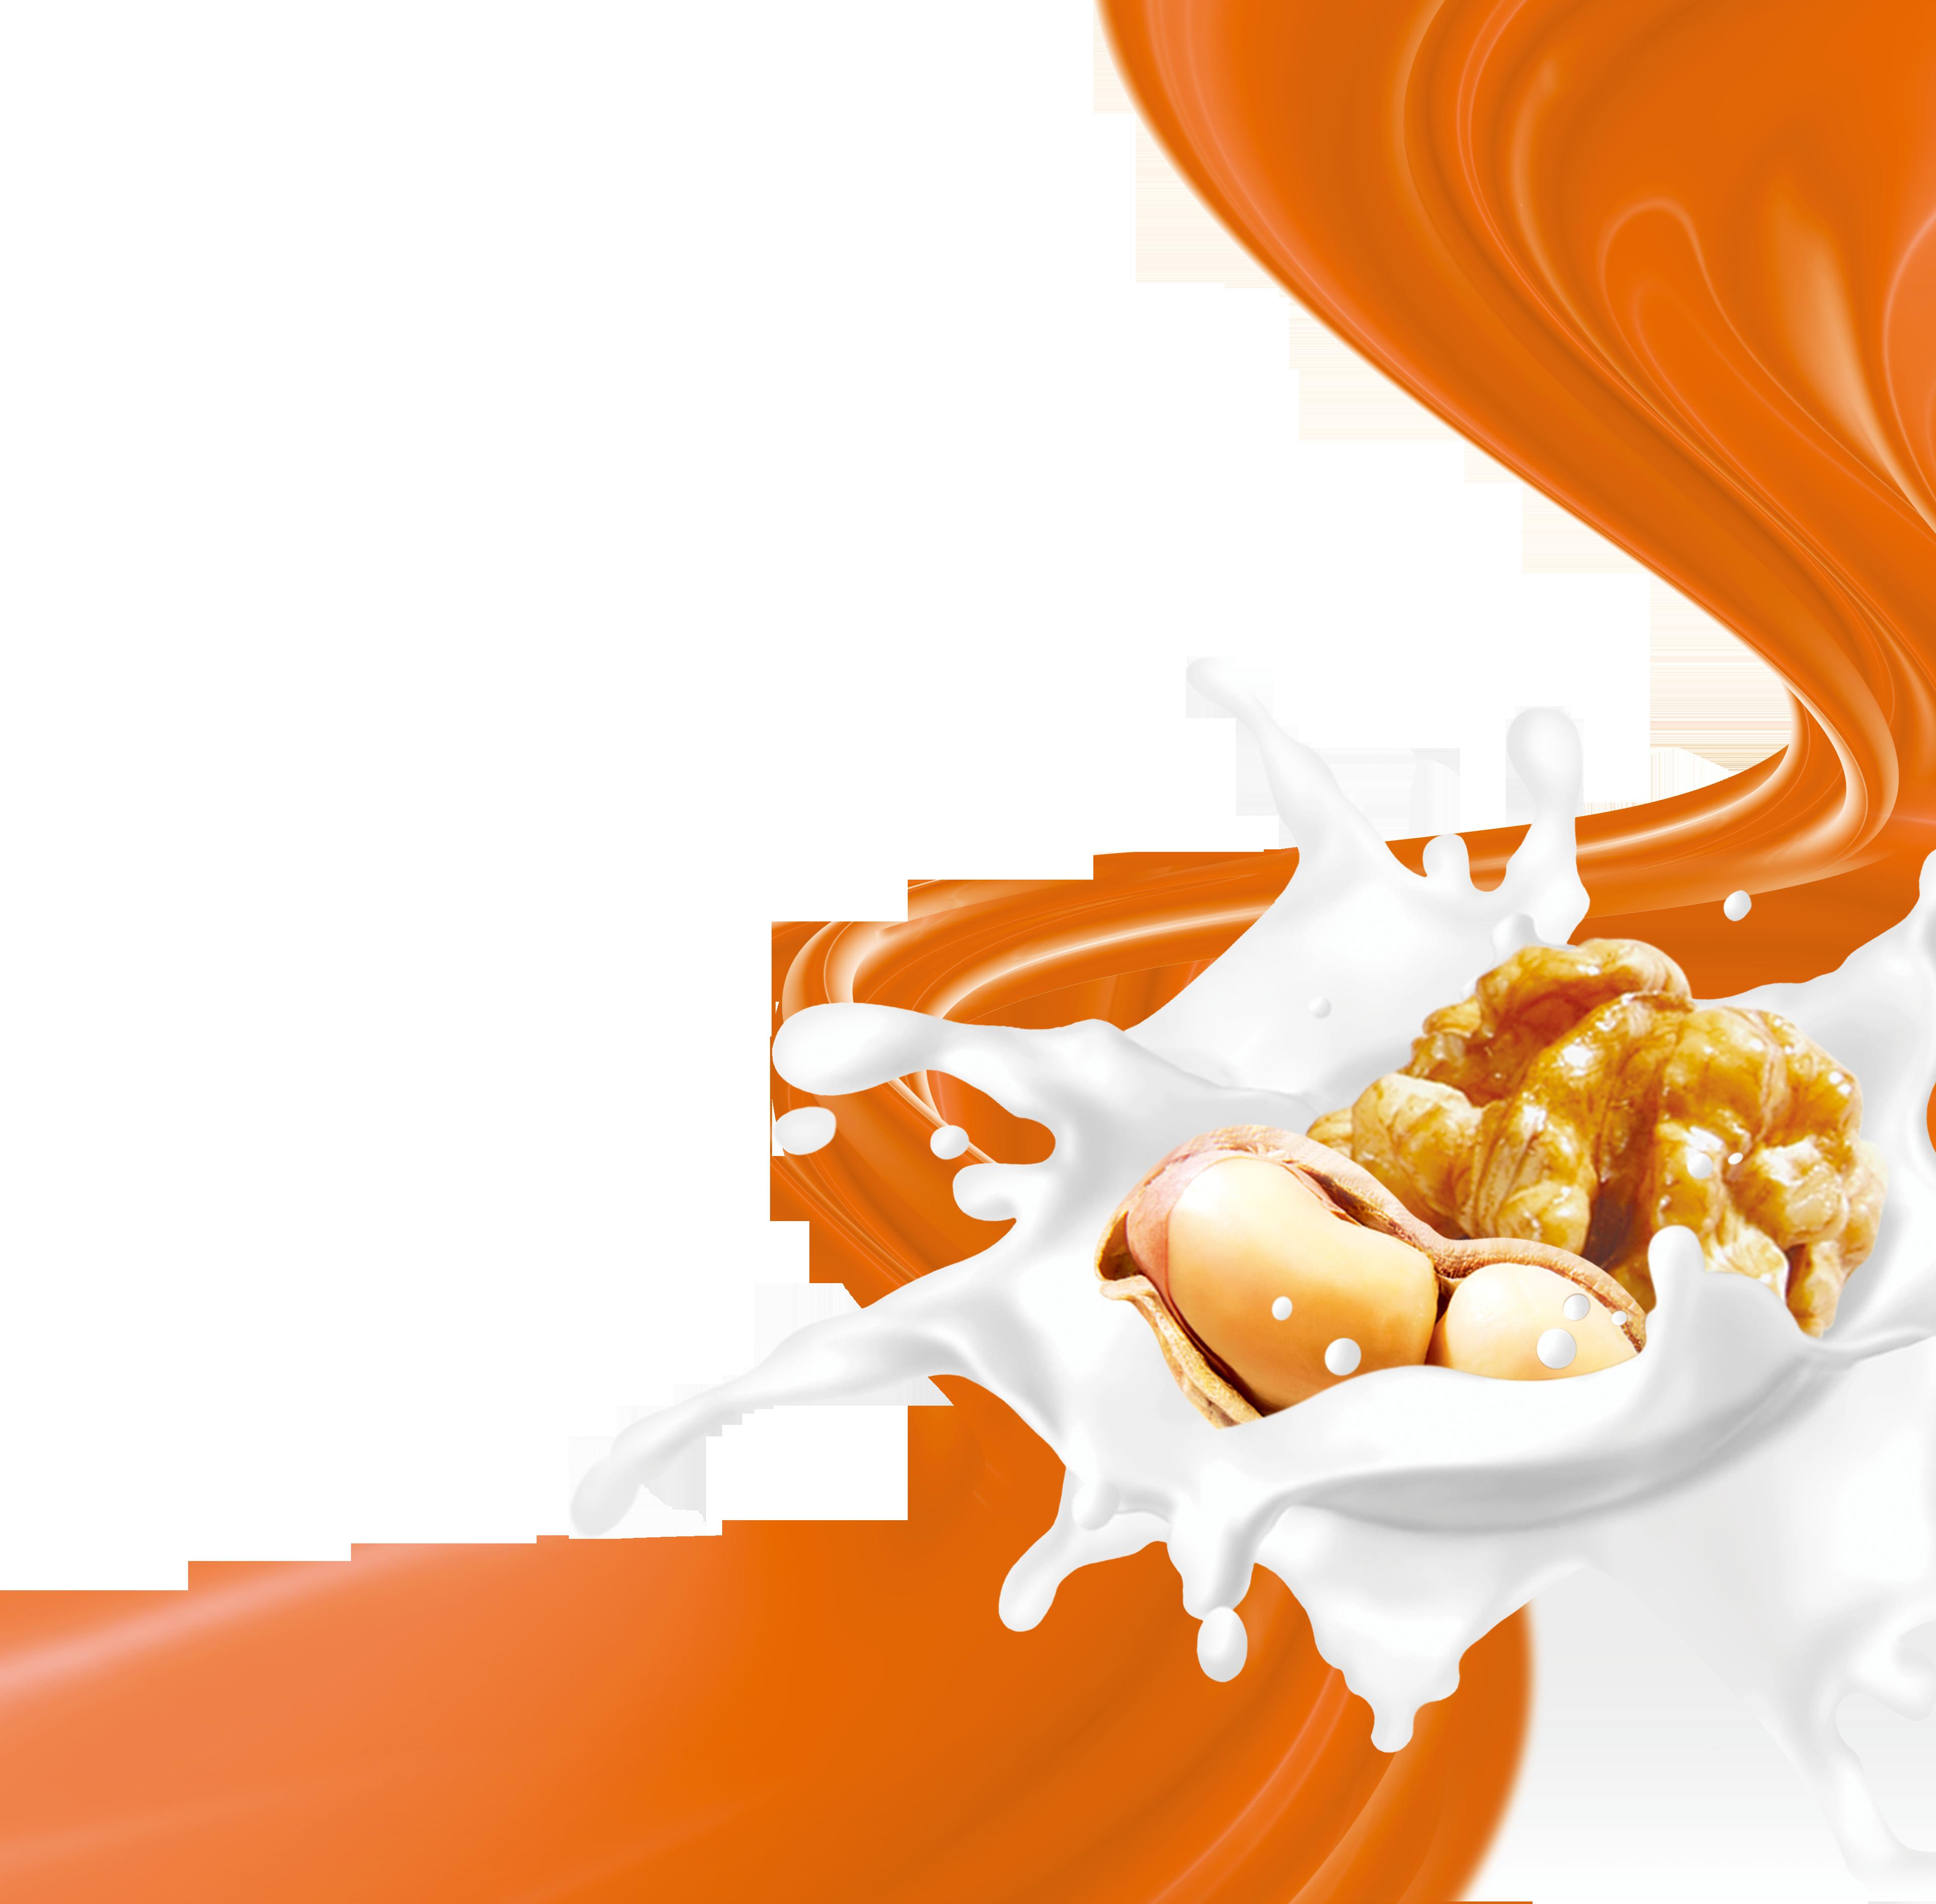 Clipart milk milk packaging. Juice soured walnut and